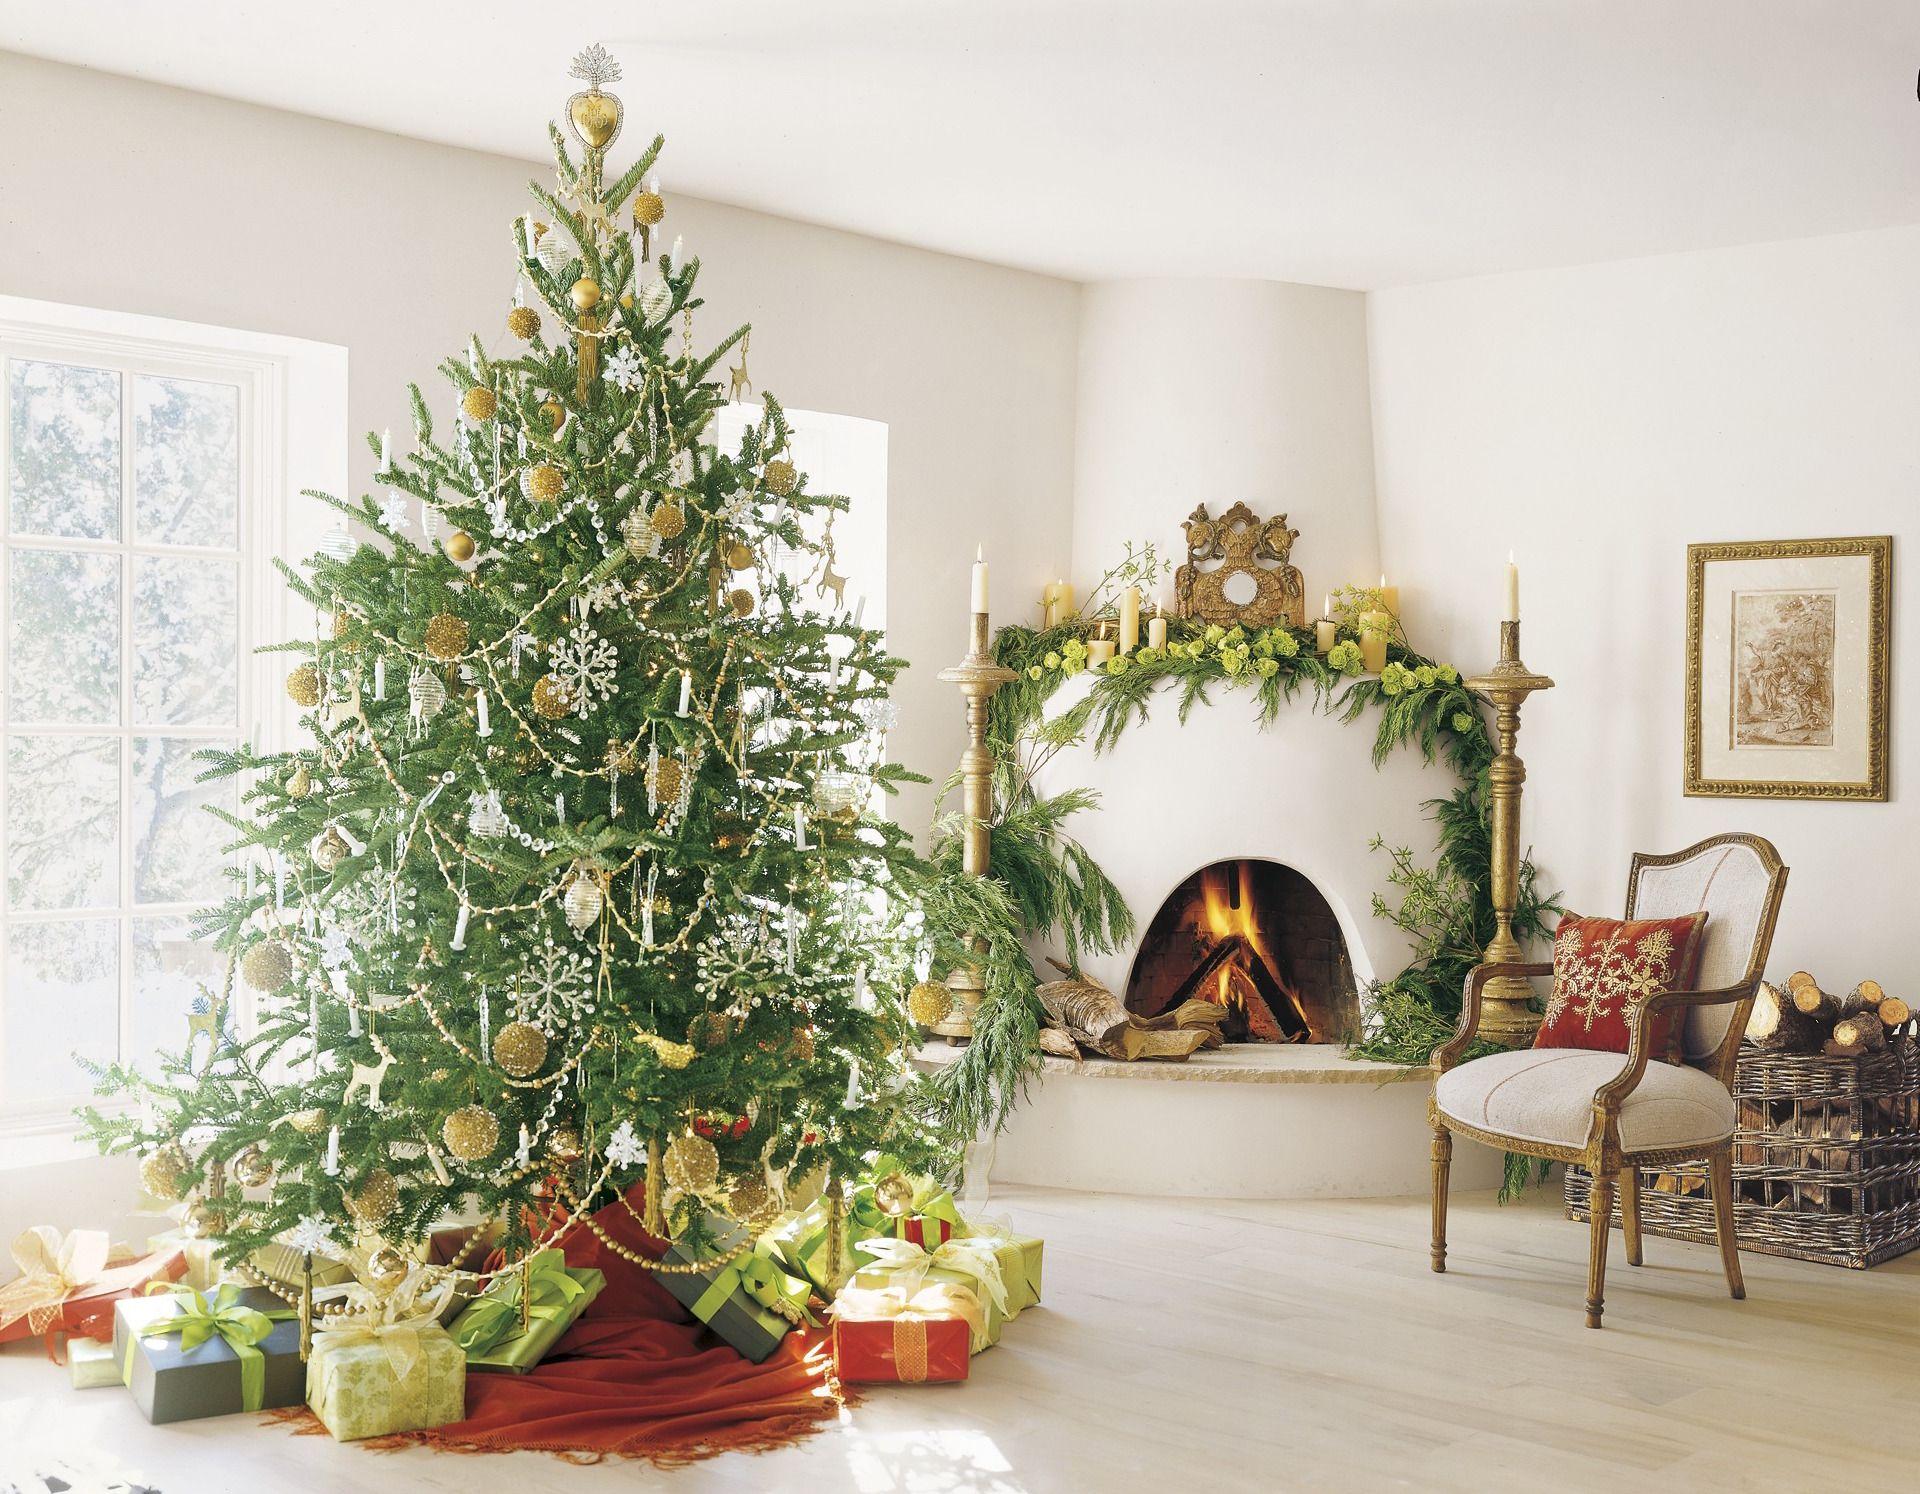 25 Christmas Decoration Ideas - Christmas Decorating Through Three ...